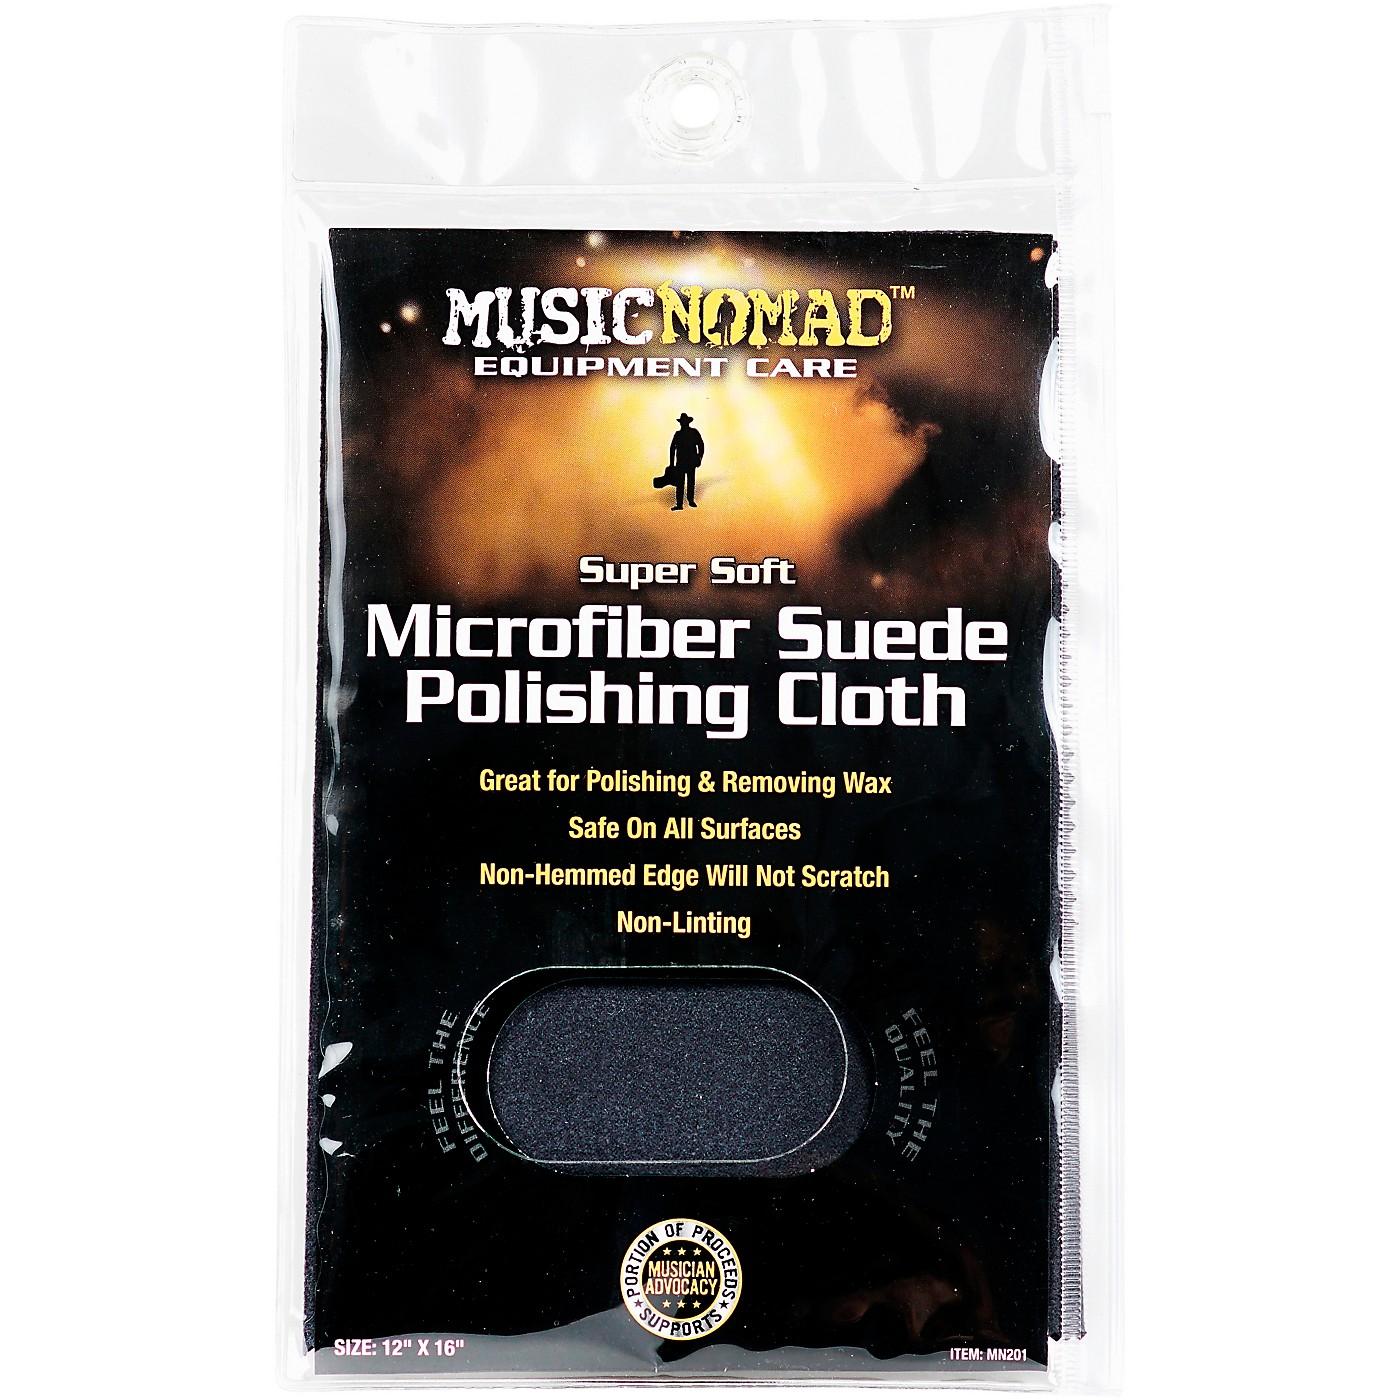 Music Nomad Super Soft Edgeless Microfiber Suede Polishing Cloth thumbnail